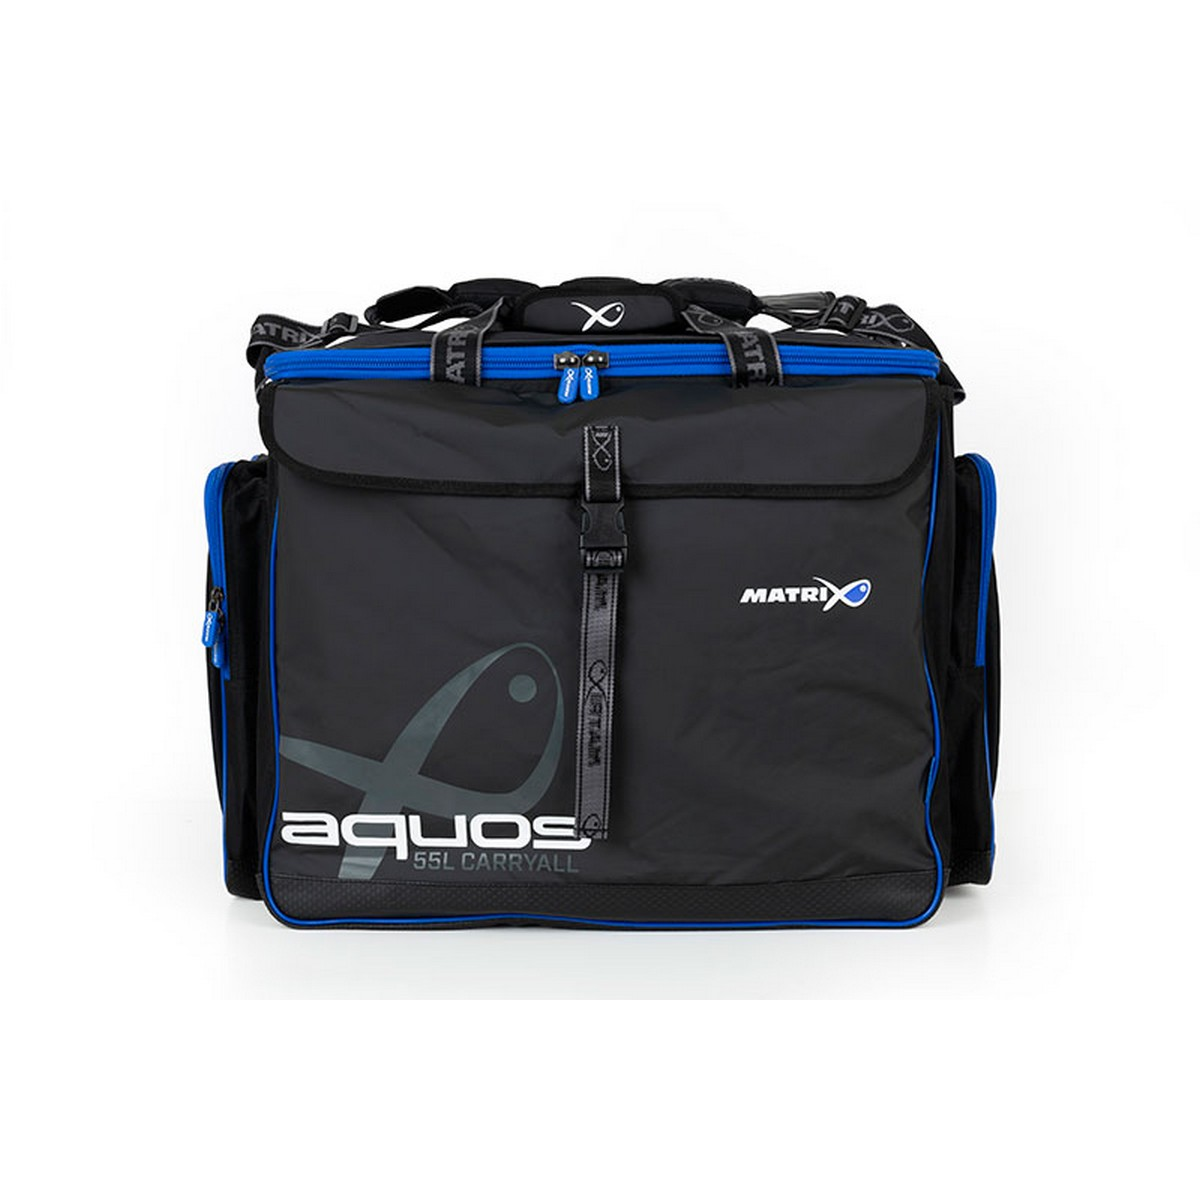 Чанта Matrix Aquos Carryall 55Ltr